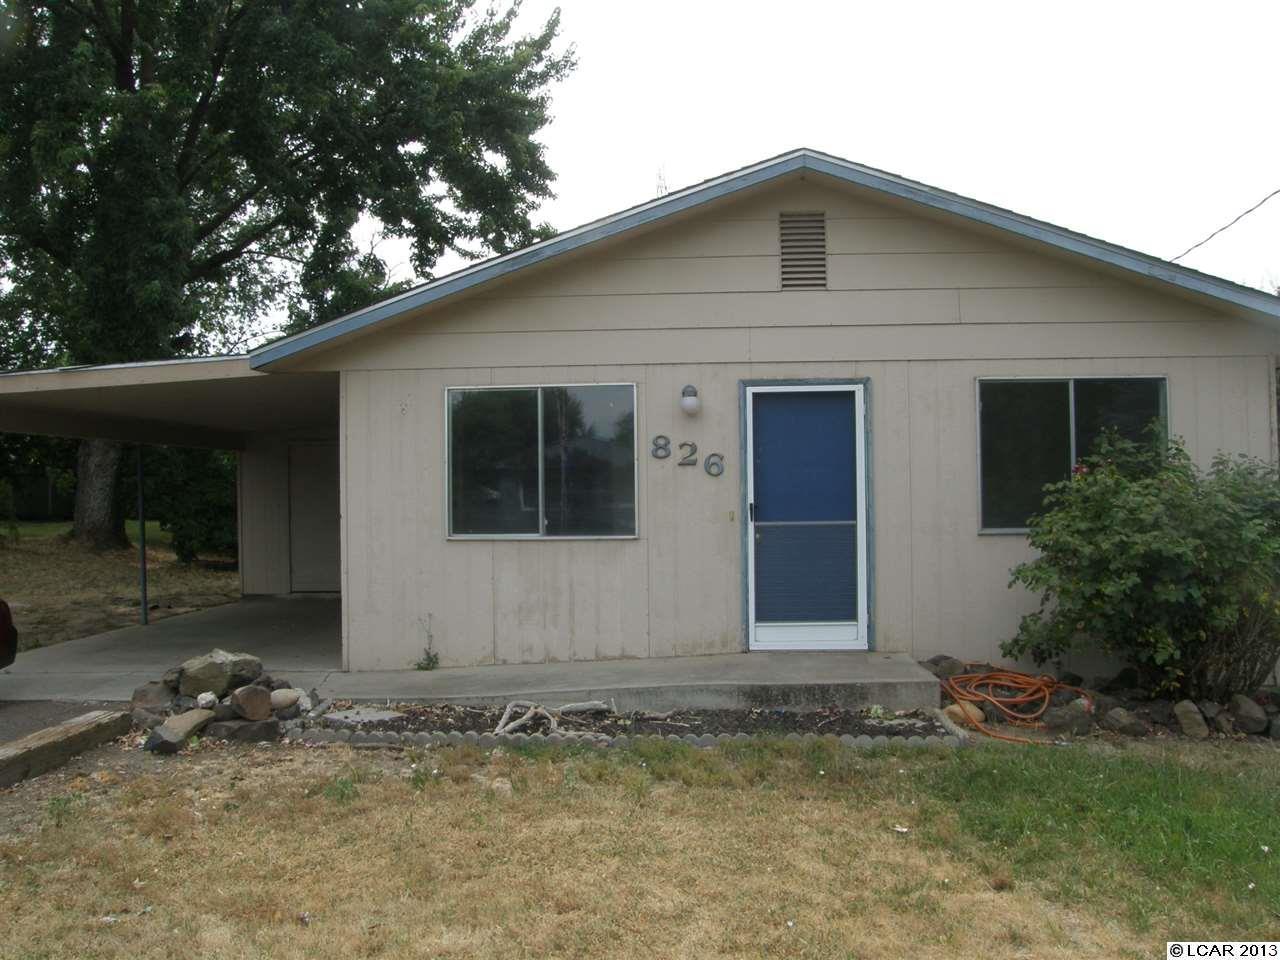 826 Van Arsdol St, Clarkston, WA 99403